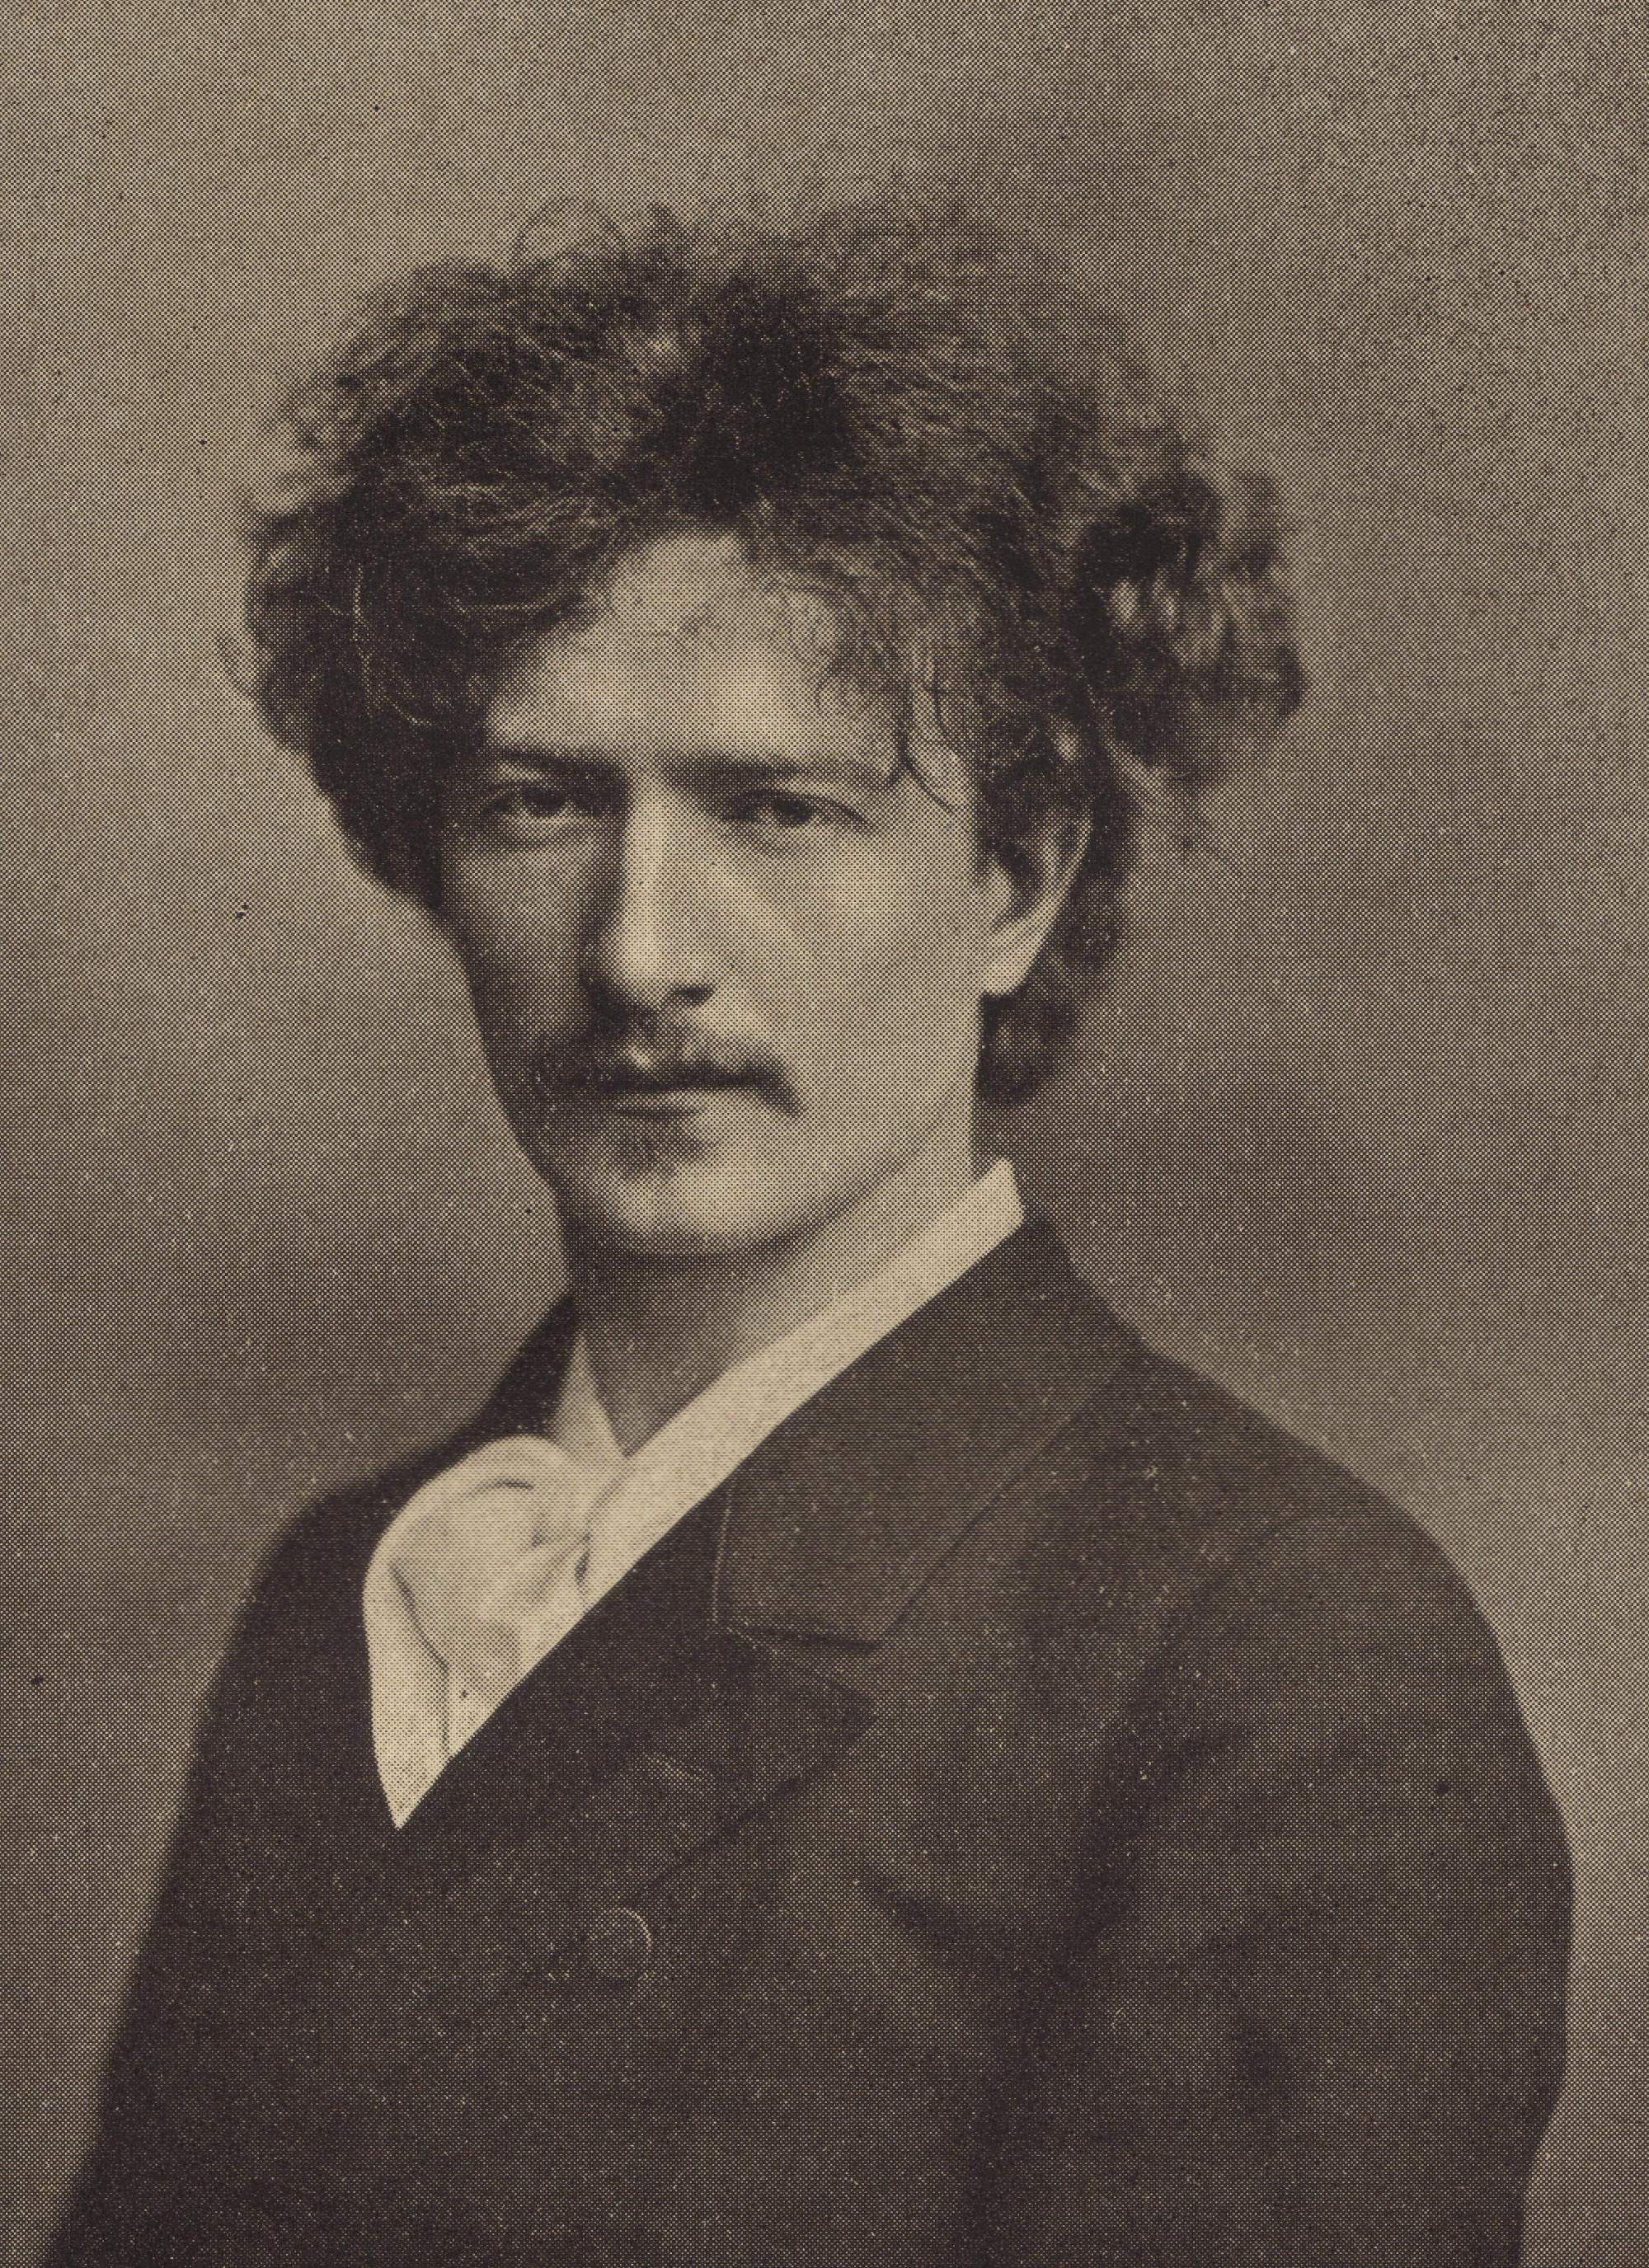 Ignacy Paderewski (1912-1930)